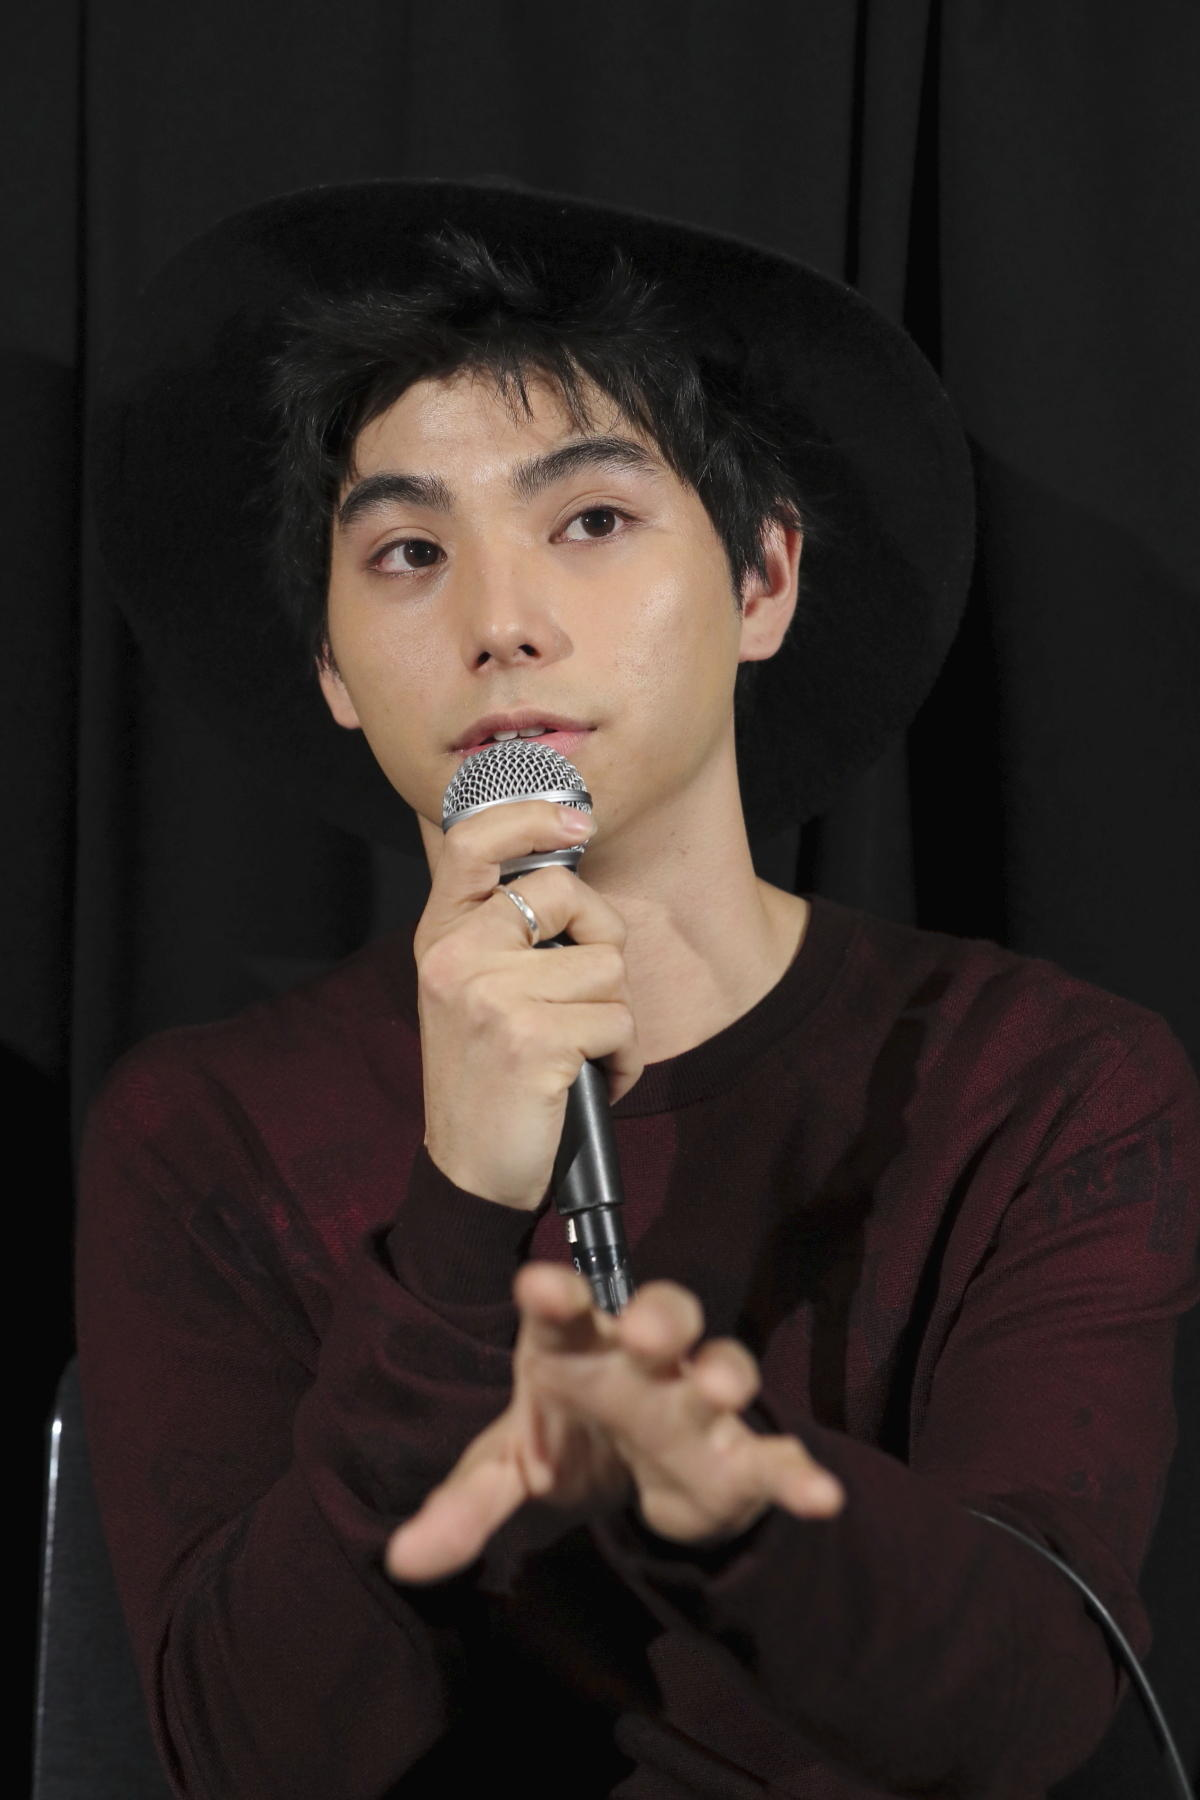 http://news.yoshimoto.co.jp/20181102010344-5168520ac992359c1e5790f7236a9ac503be37c3.jpg